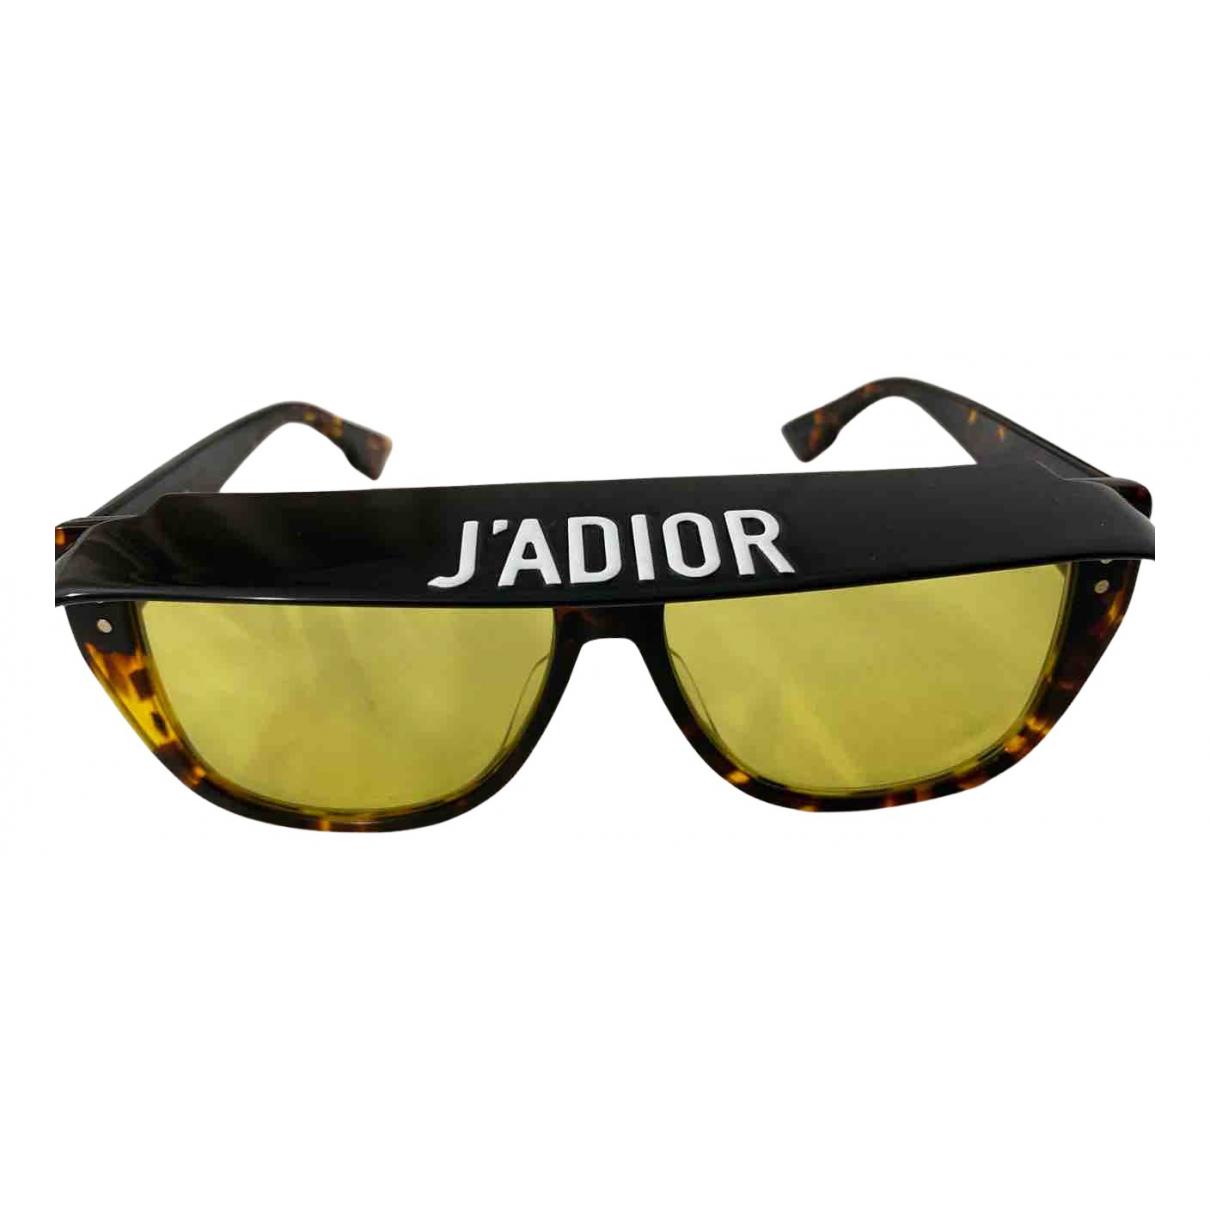 Dior Diorclub2 Yellow Sunglasses for Women N